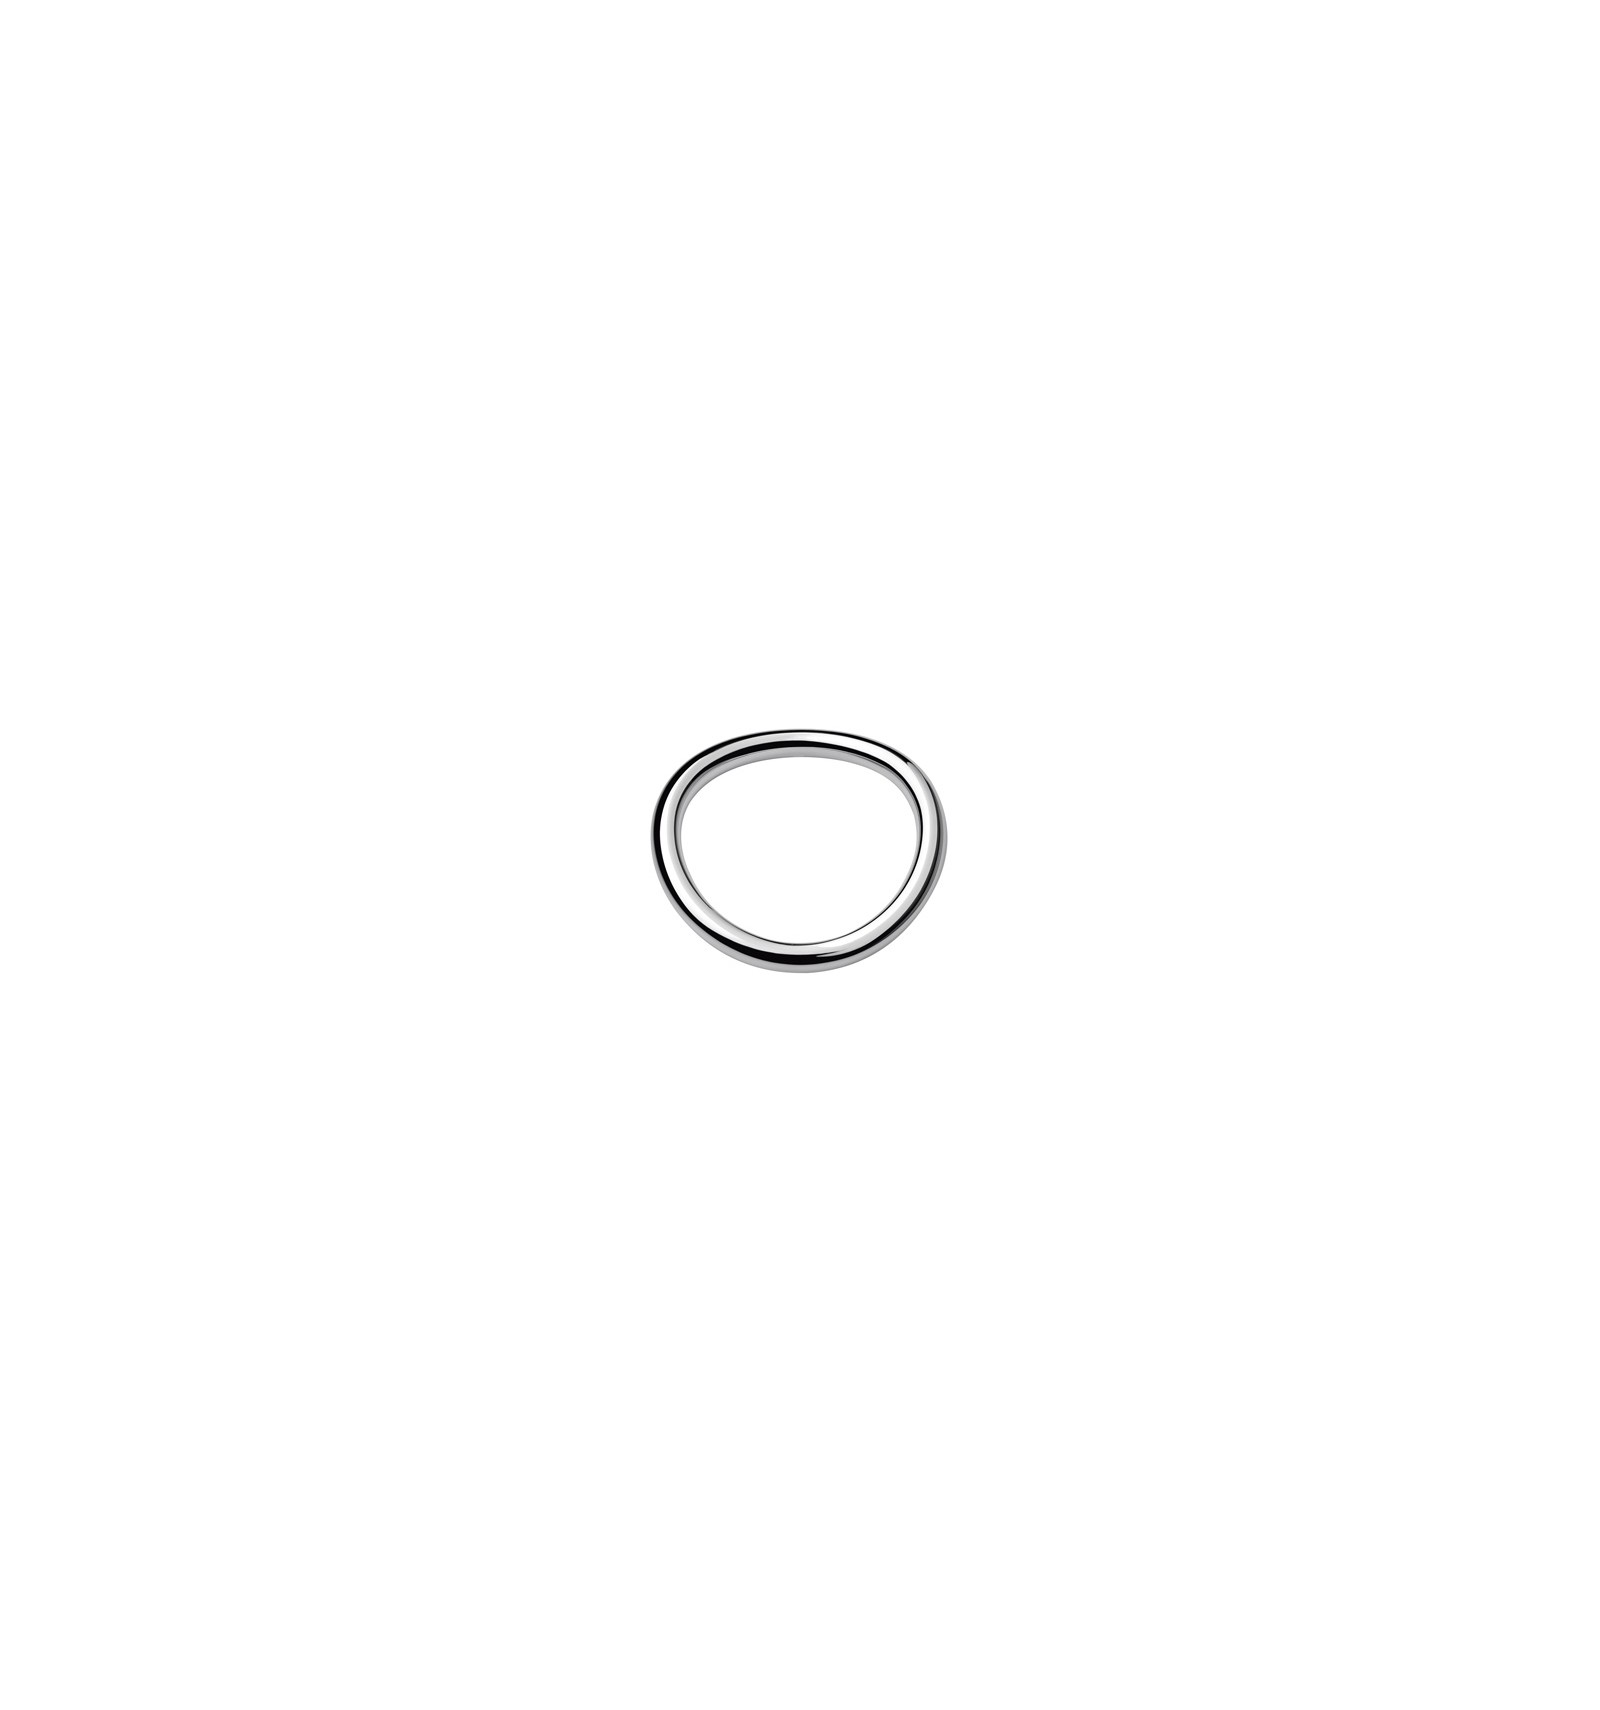 christofle collection 925 bague jonc anneau argent t51 argent massif 925 my way. Black Bedroom Furniture Sets. Home Design Ideas